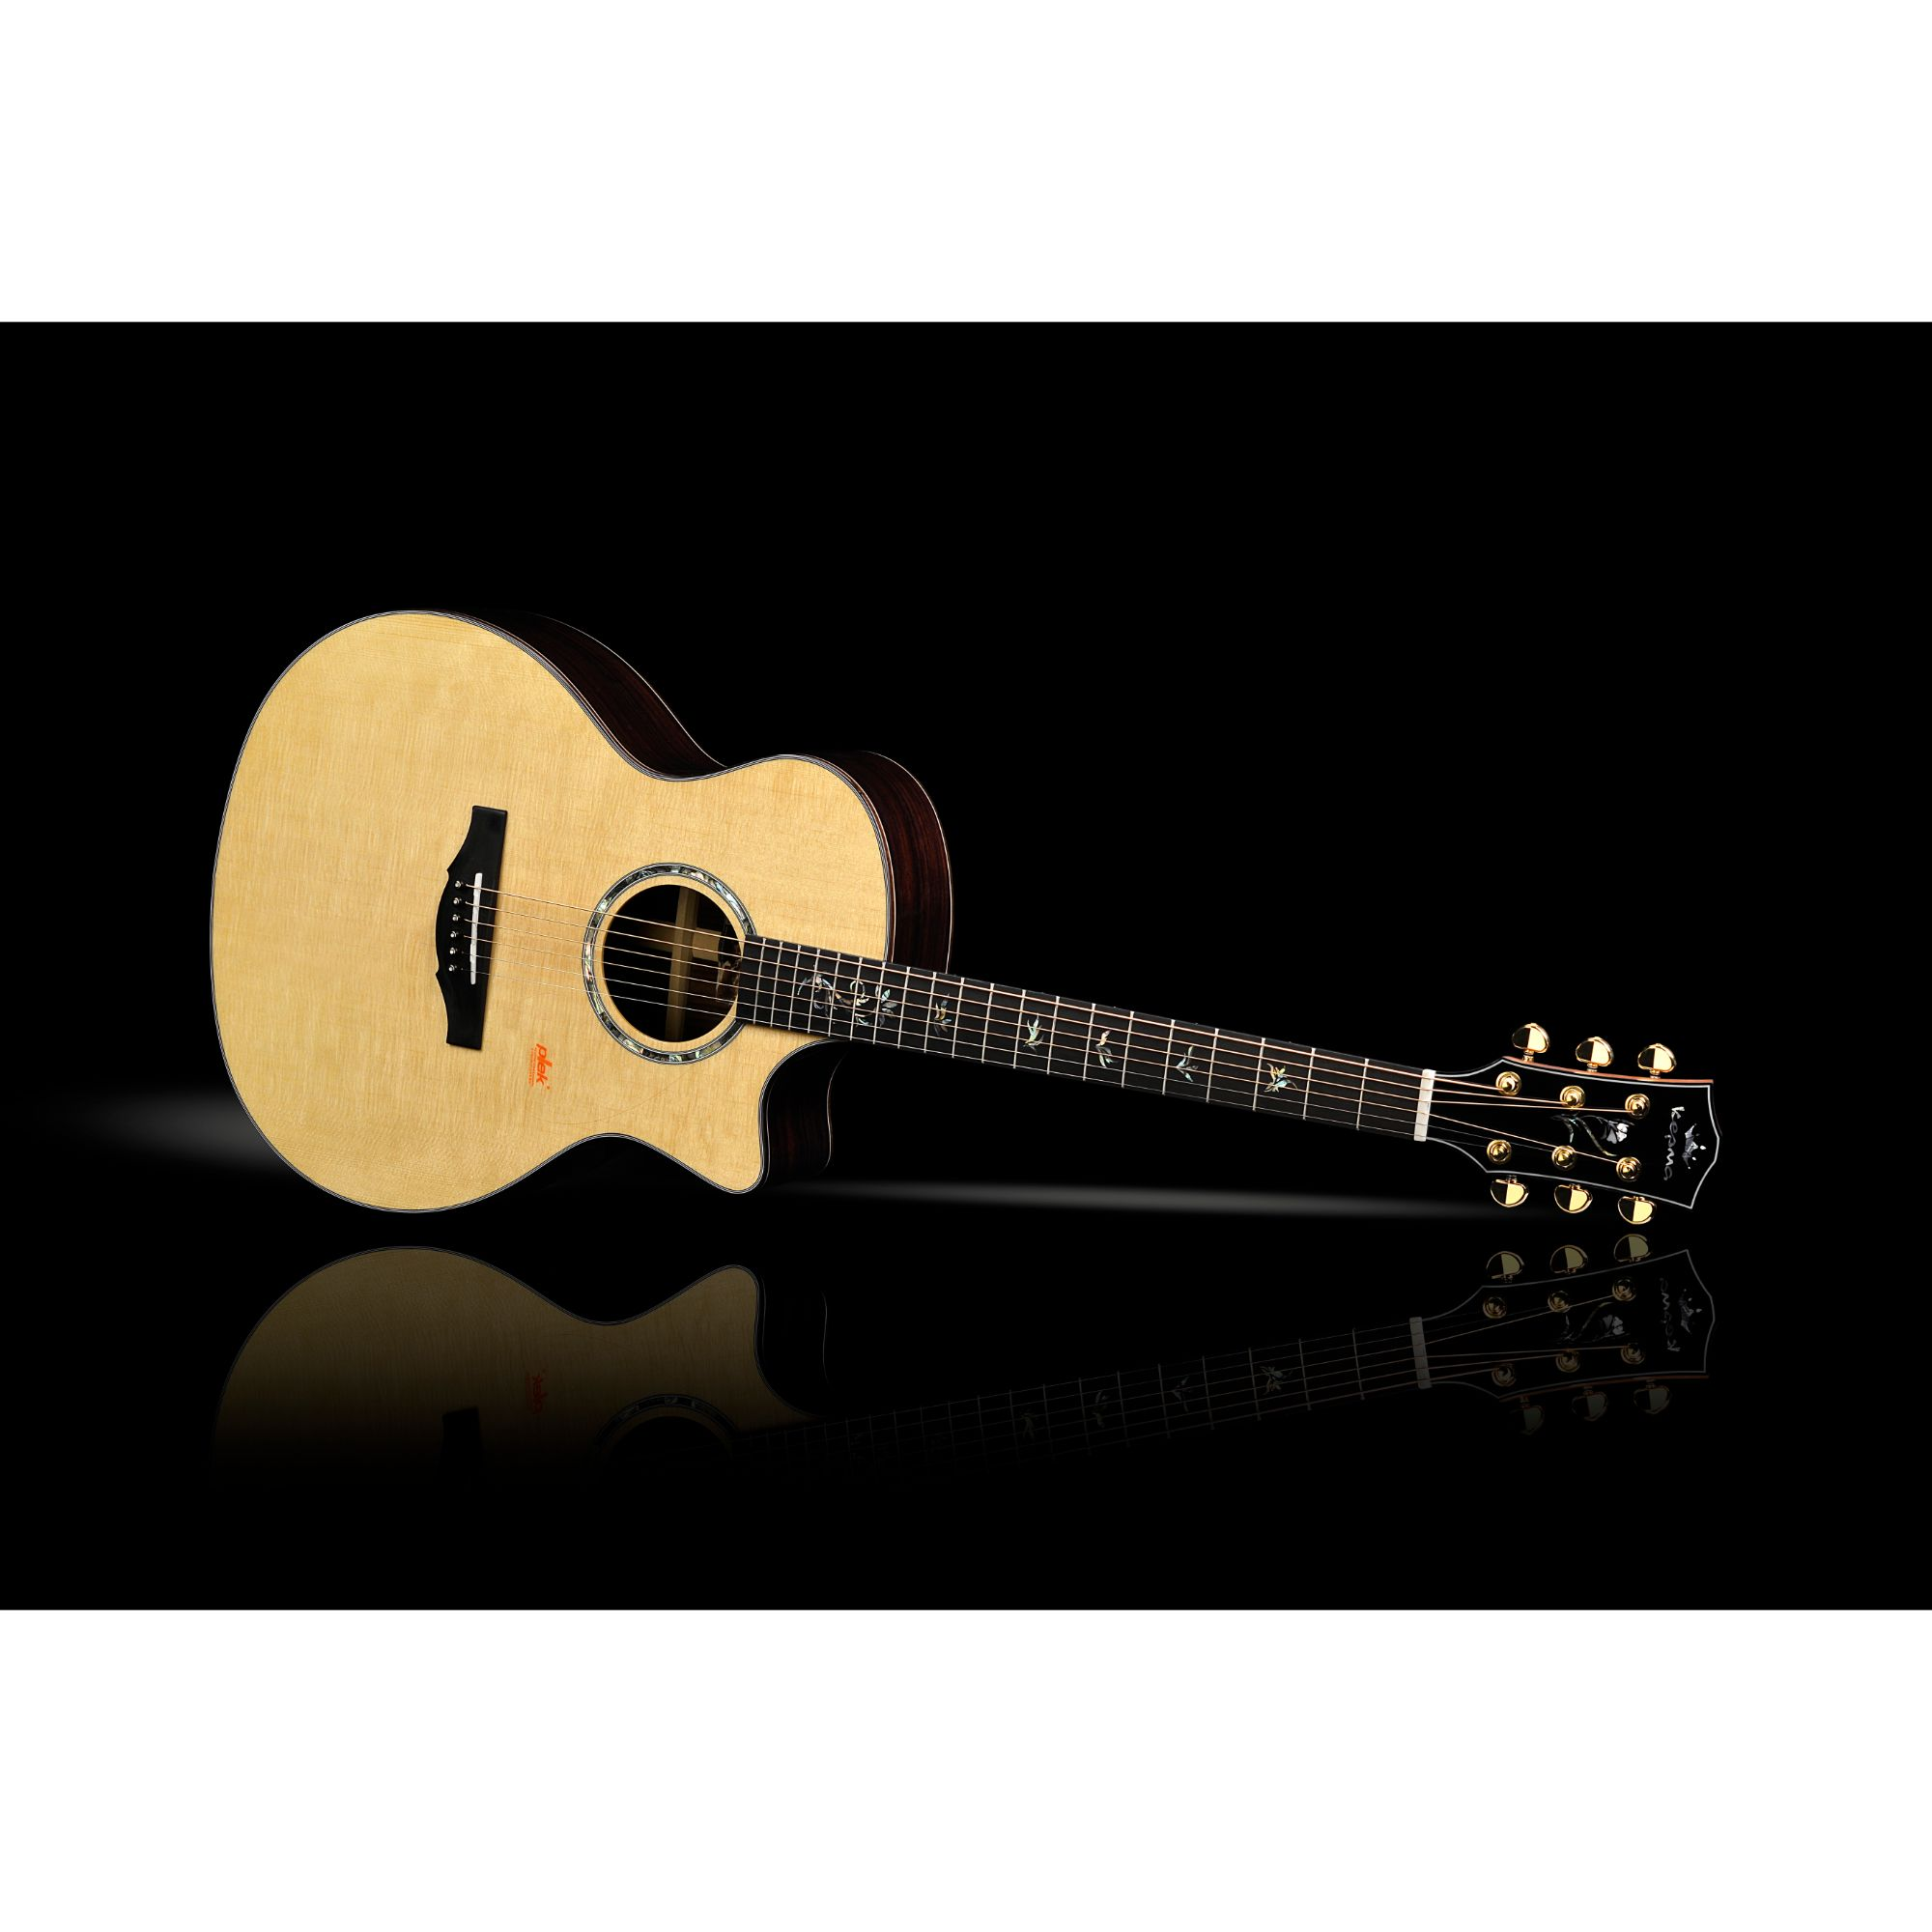 Kepma B1GA Grand Auditorium All Solid Guitar